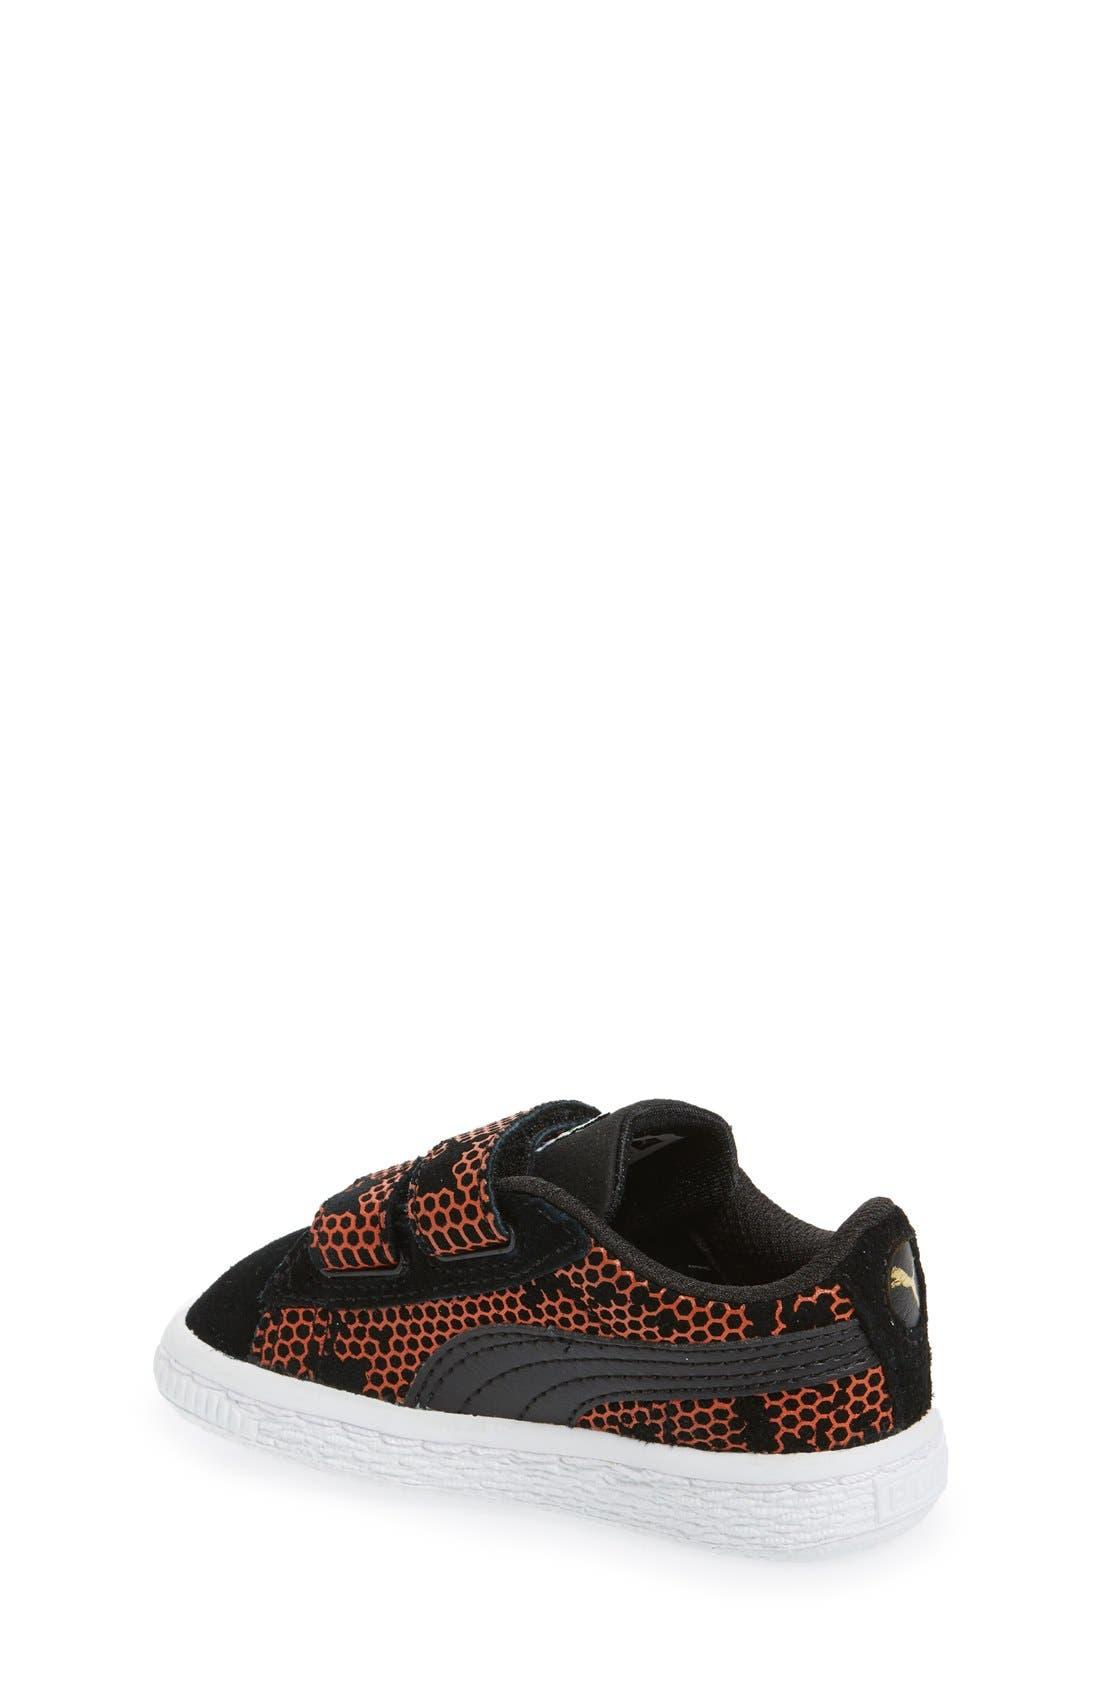 'Night Camo' Sneaker,                             Alternate thumbnail 2, color,                             Puma Black/ Mandarine Red